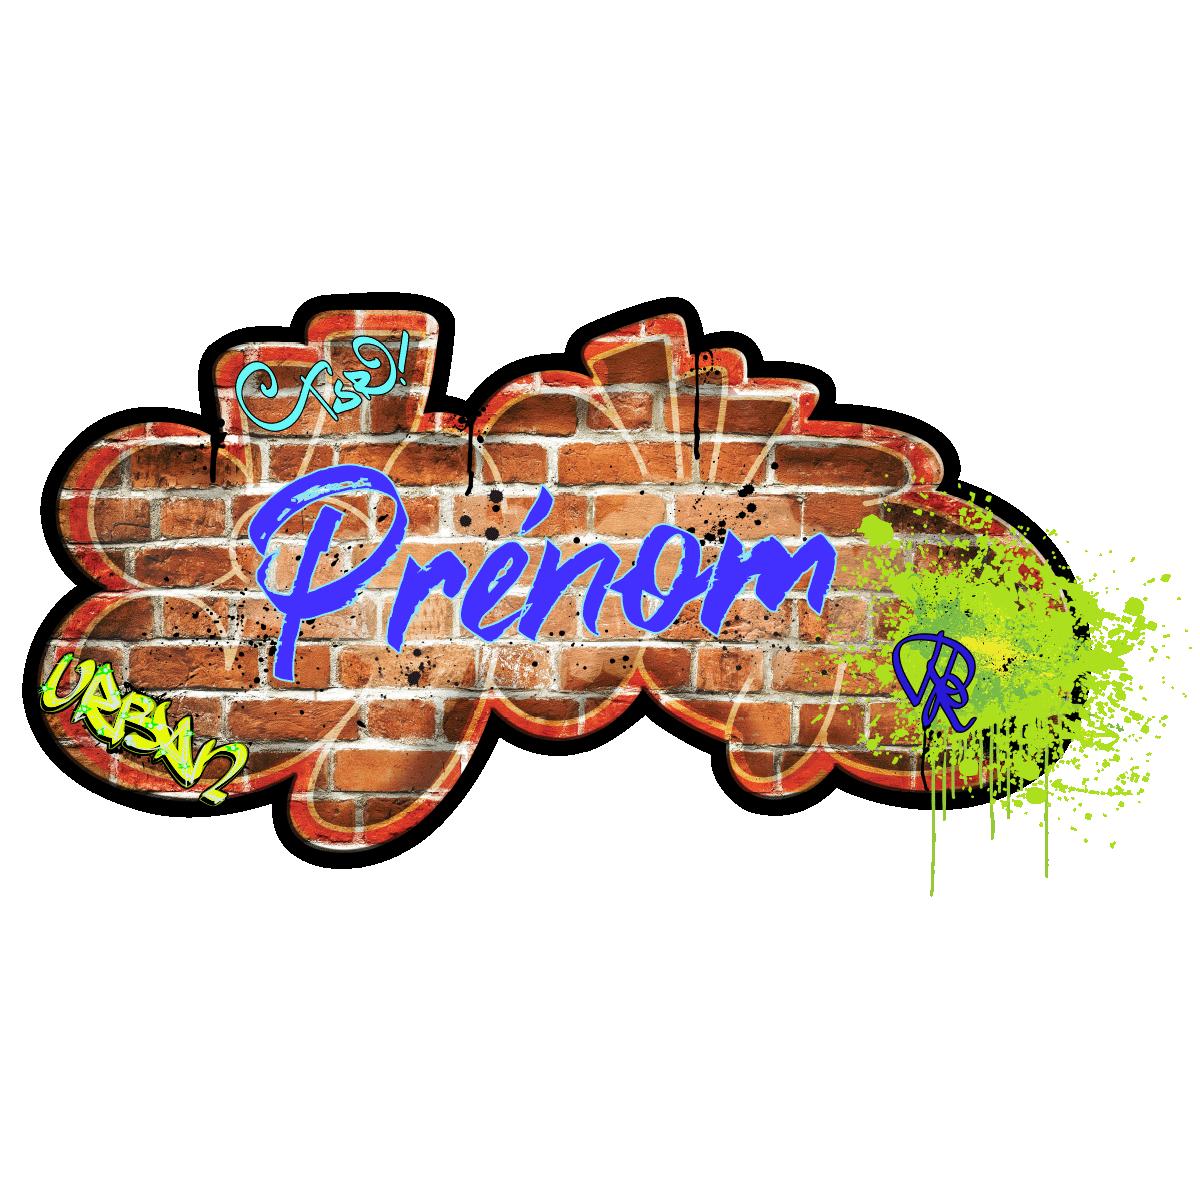 Sticker pr nom personnalisable mur de graffiti stickers chambre enfants pr noms ambiance sticker - Graffiti prenom gratuit ...